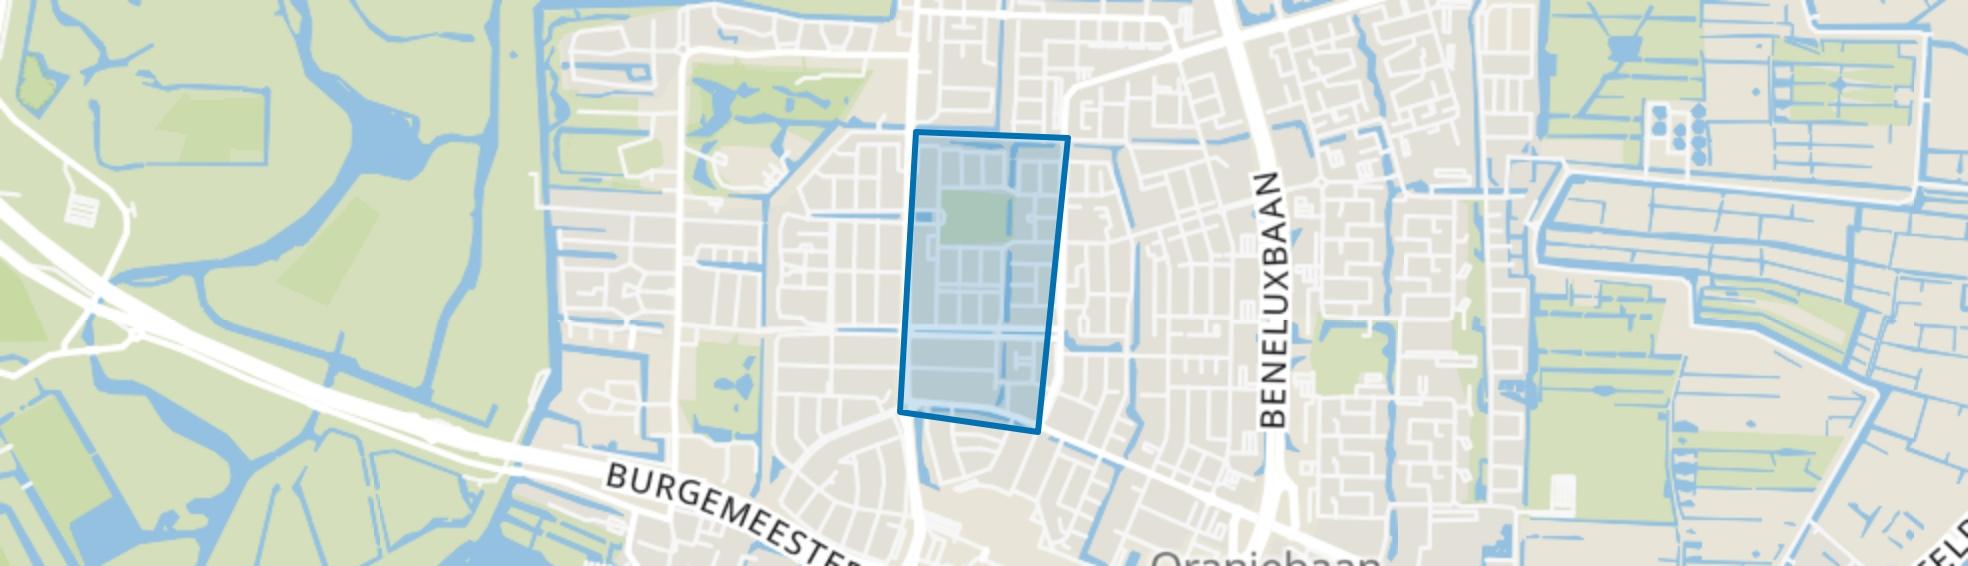 Kruiskerkbuurt, Amstelveen map